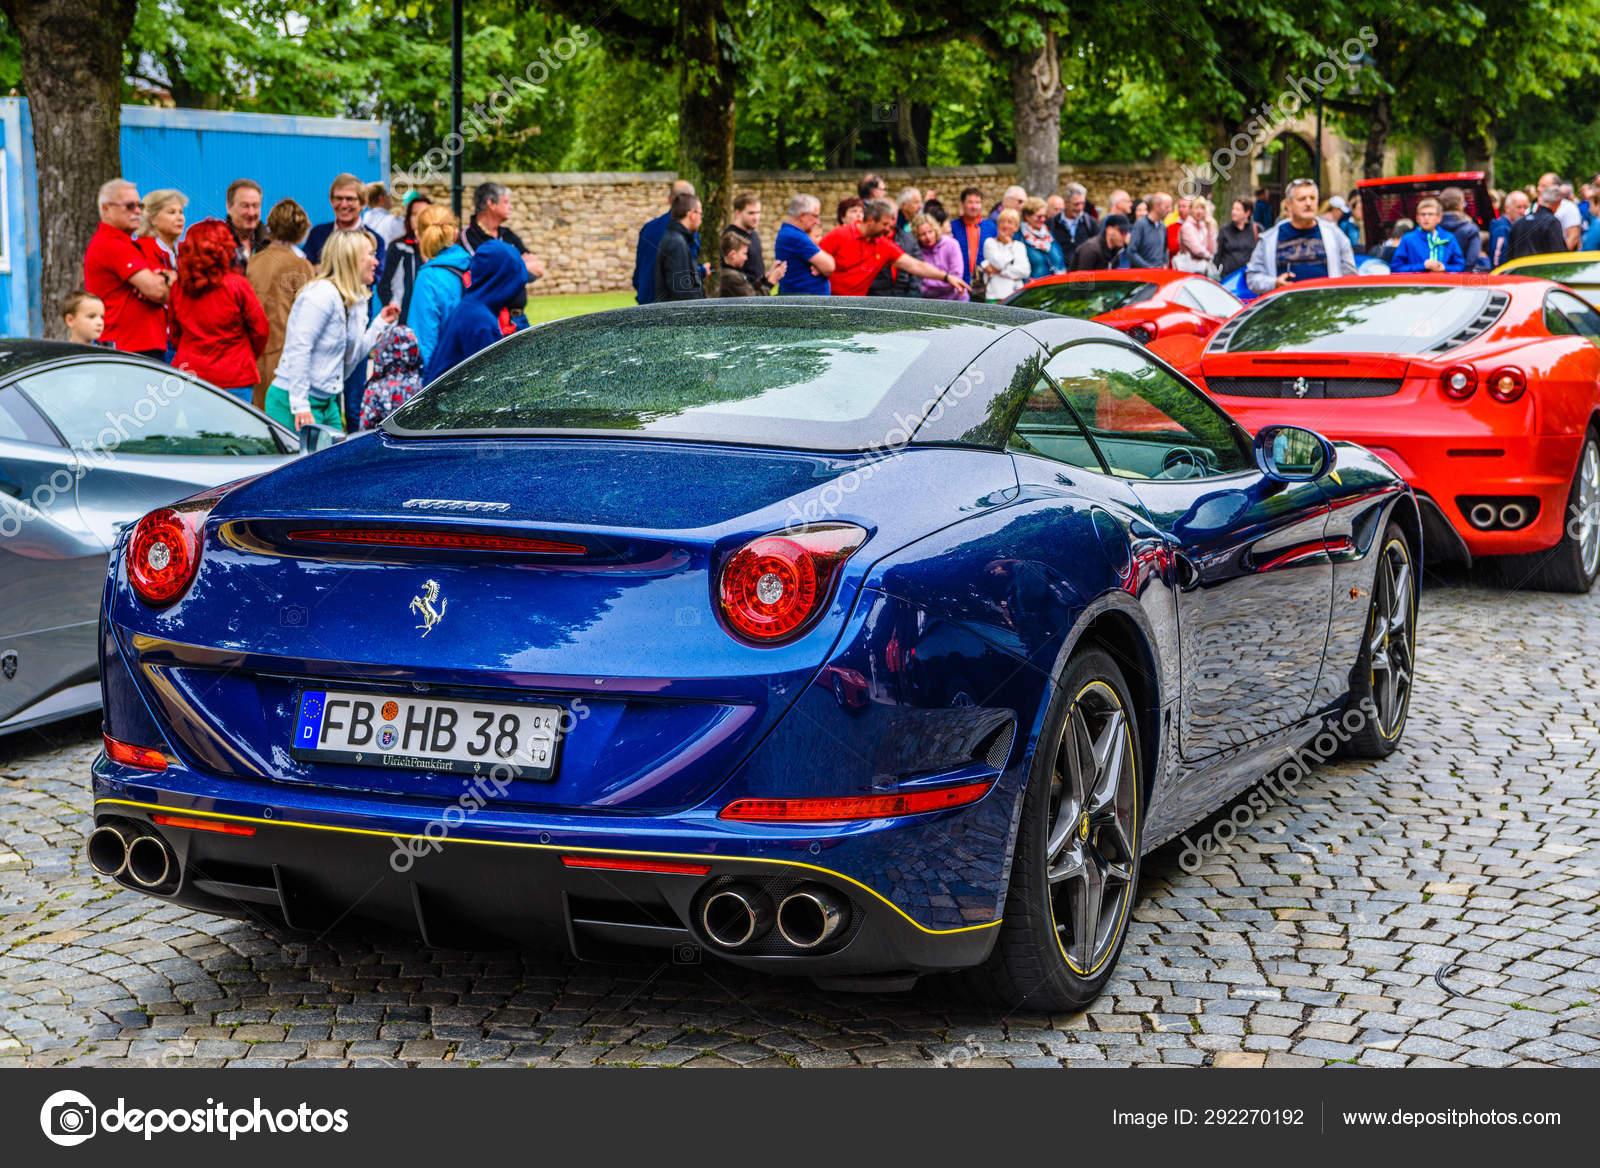 Germany Fulda Jul 2019 Dark Blue Ferrari California Type F14 Stock Editorial Photo Eagle2308 292270192